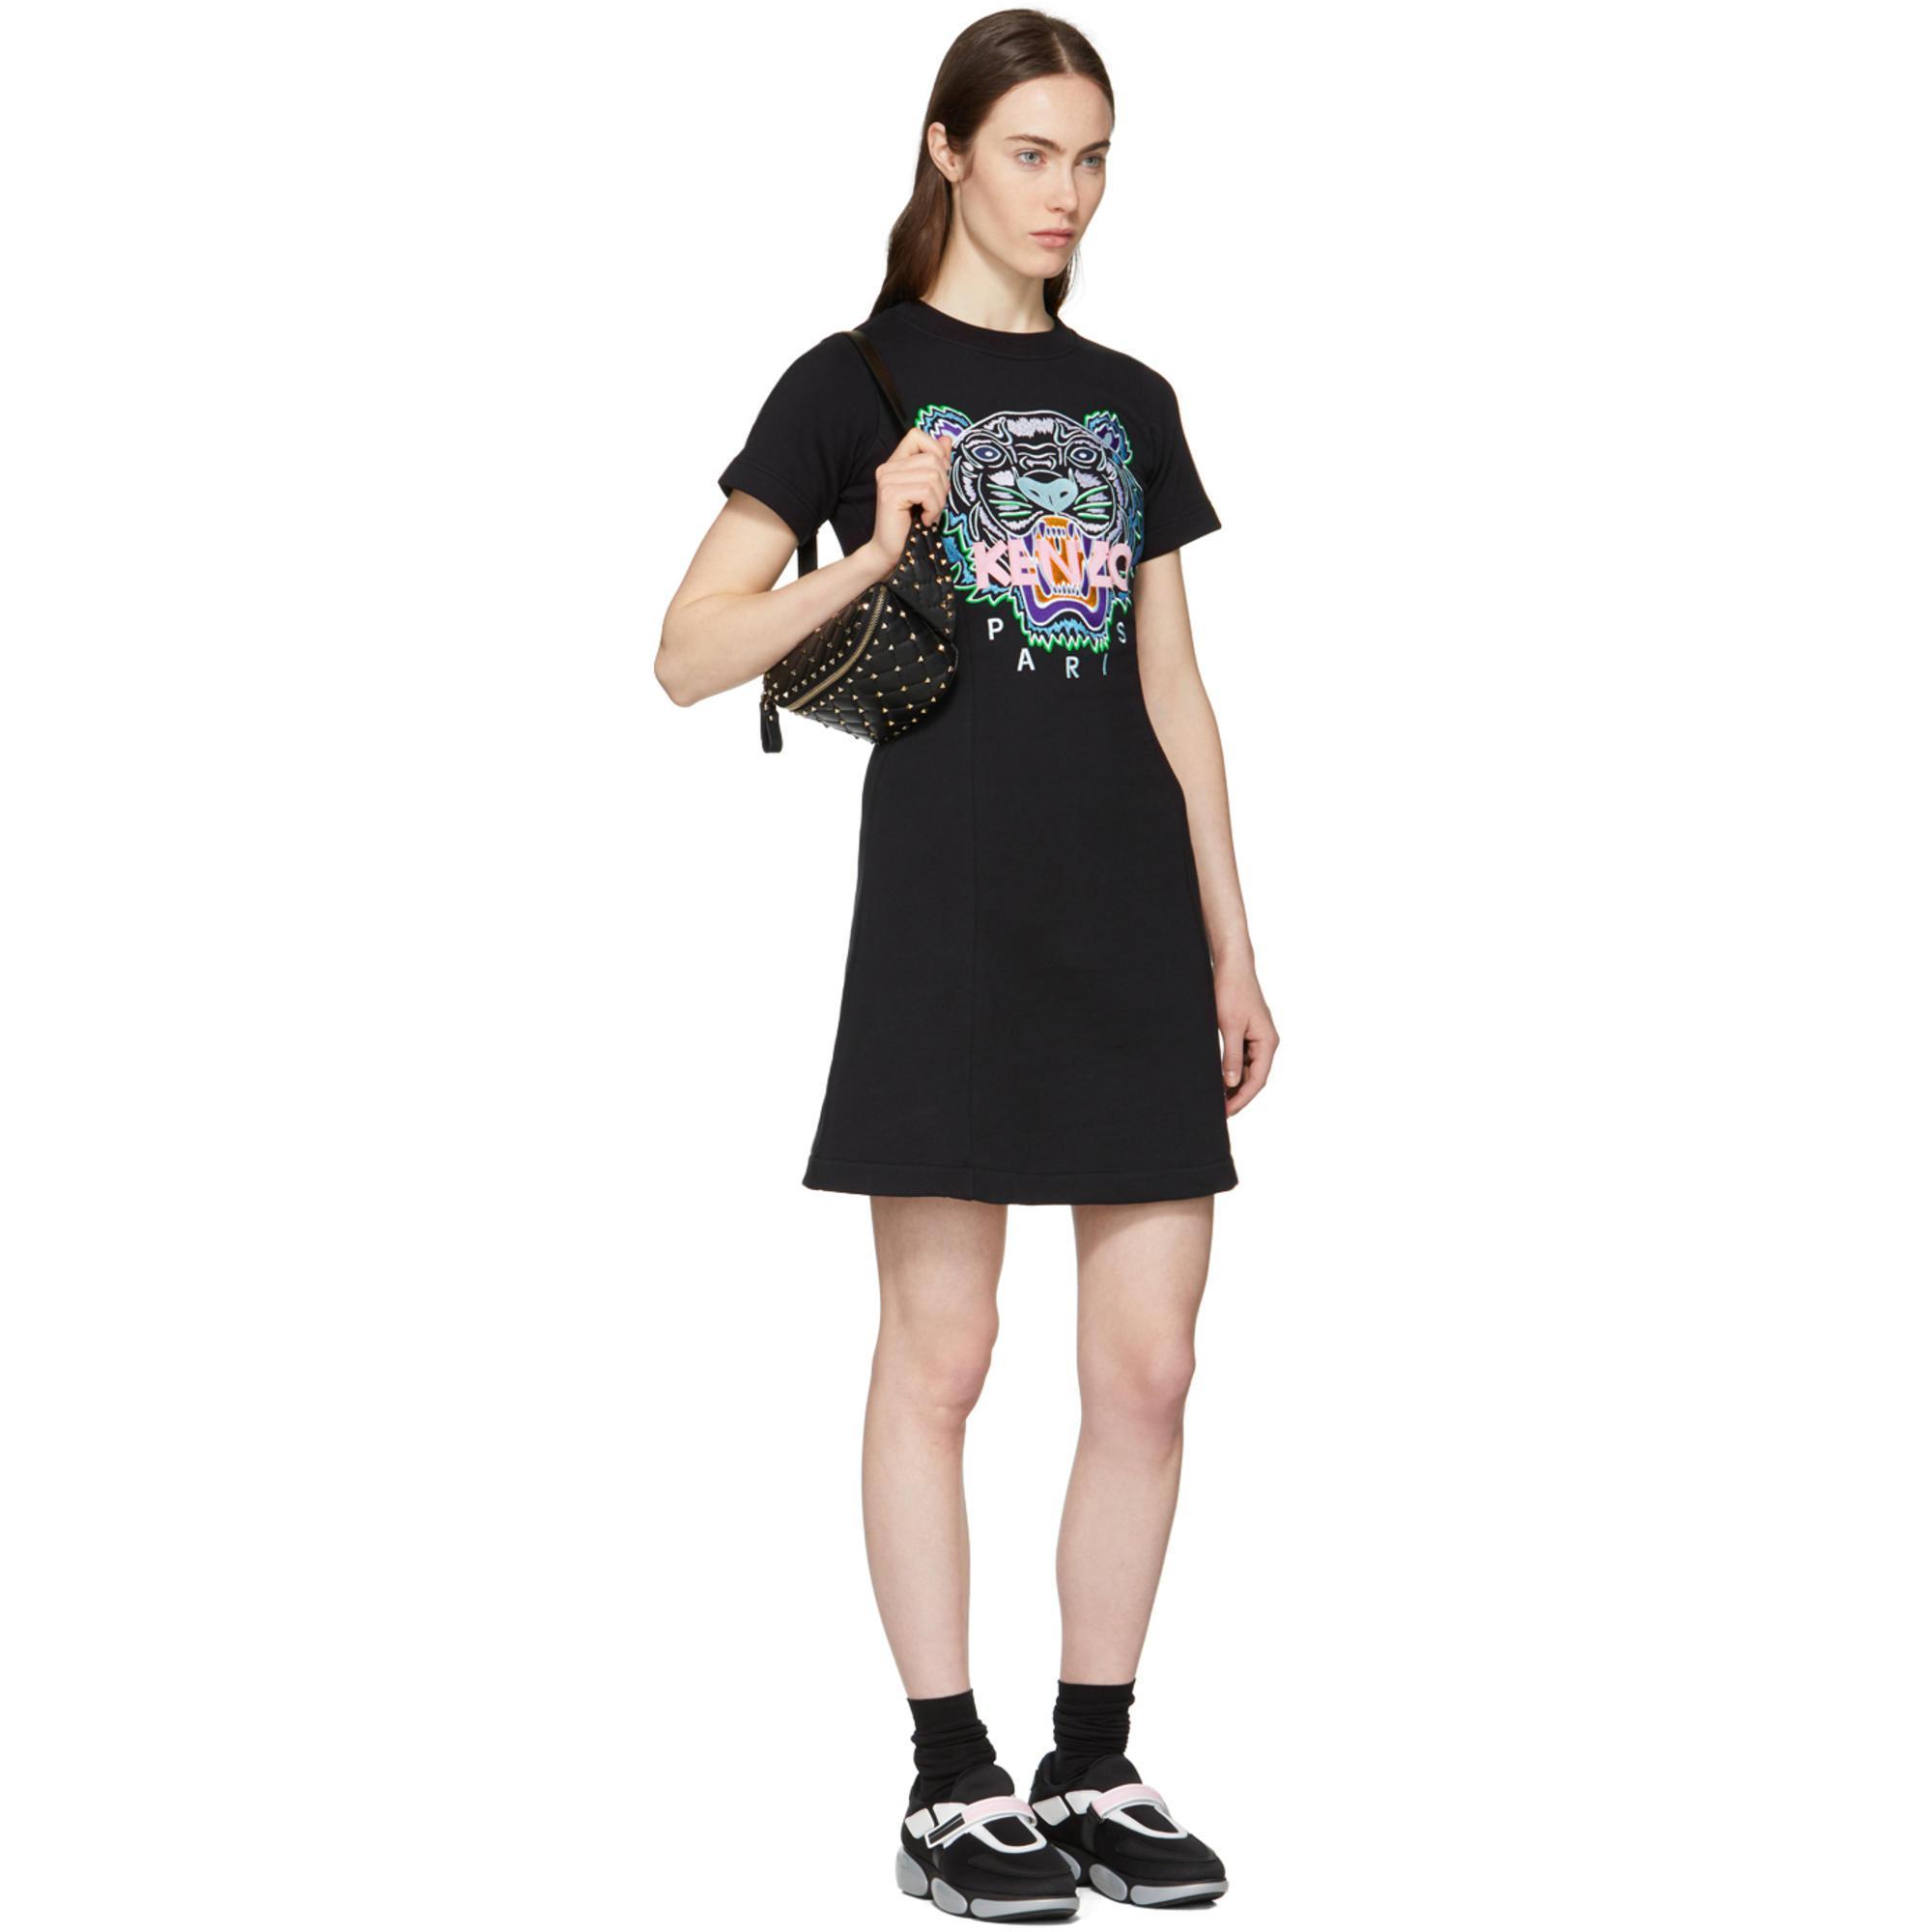 Lyst - Robe noire Tiger Flared T-Shirt KENZO en coloris Noir 6cbc18ef9b07